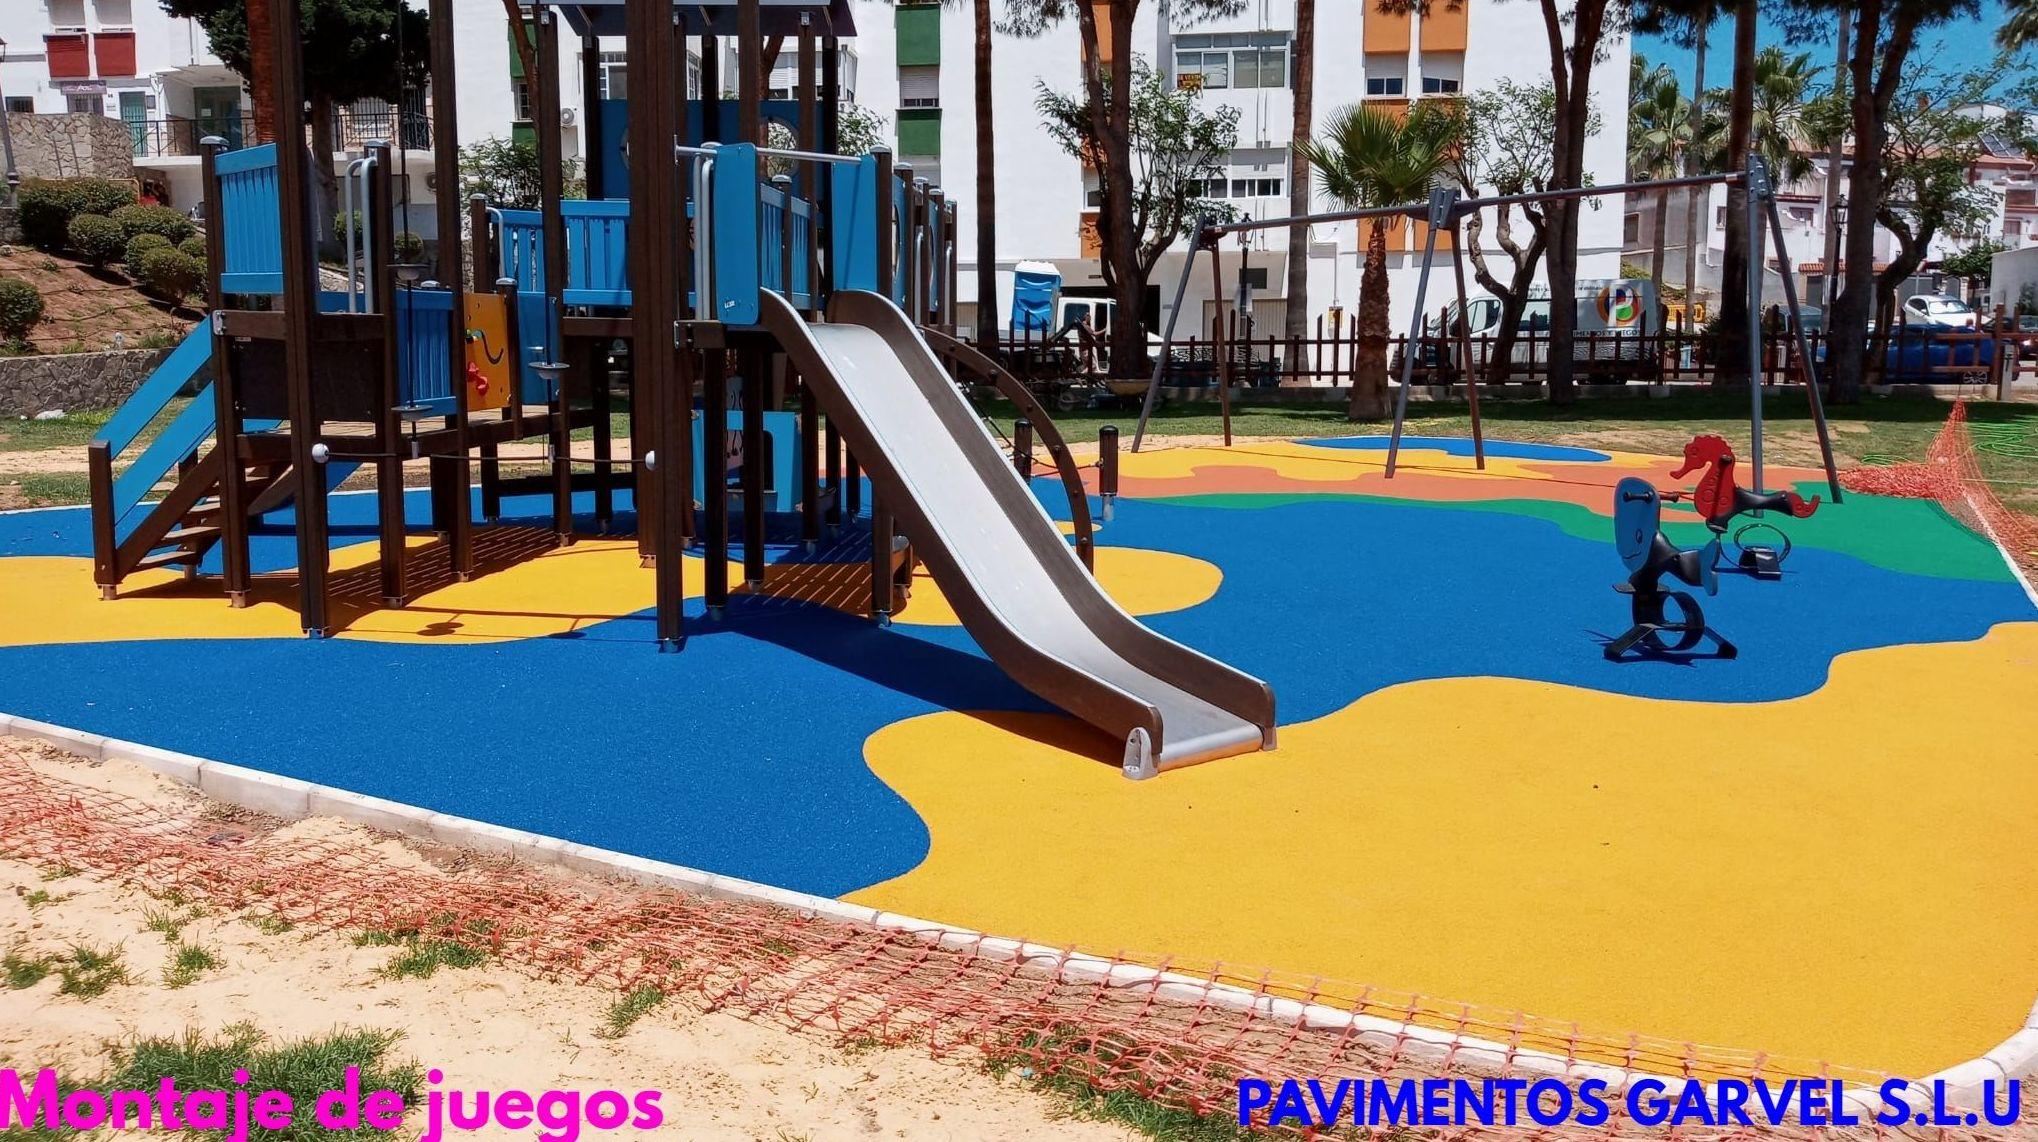 Foto 6 de Instalación de pavimentos de caucho para parques infantiles en Las Cabezas de San Juan   Pavimentos Garvel